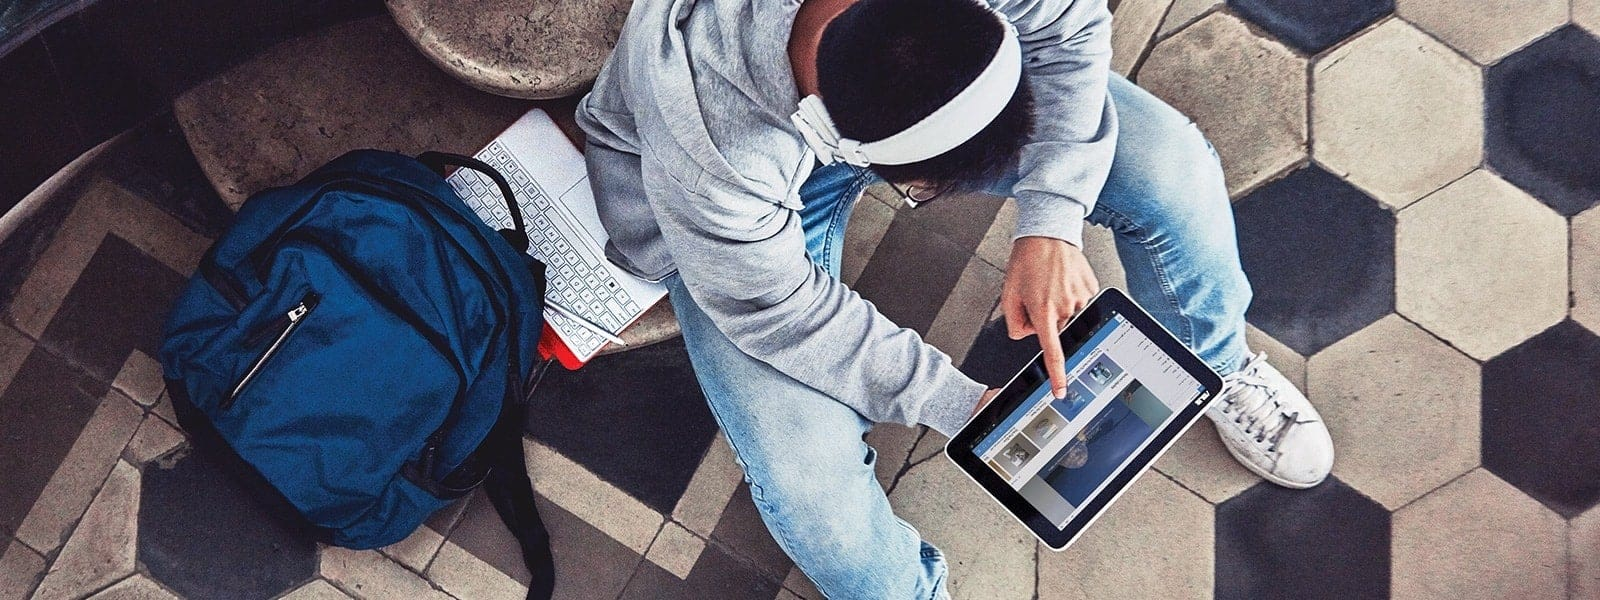 Students aplūko Windows10 ierīci